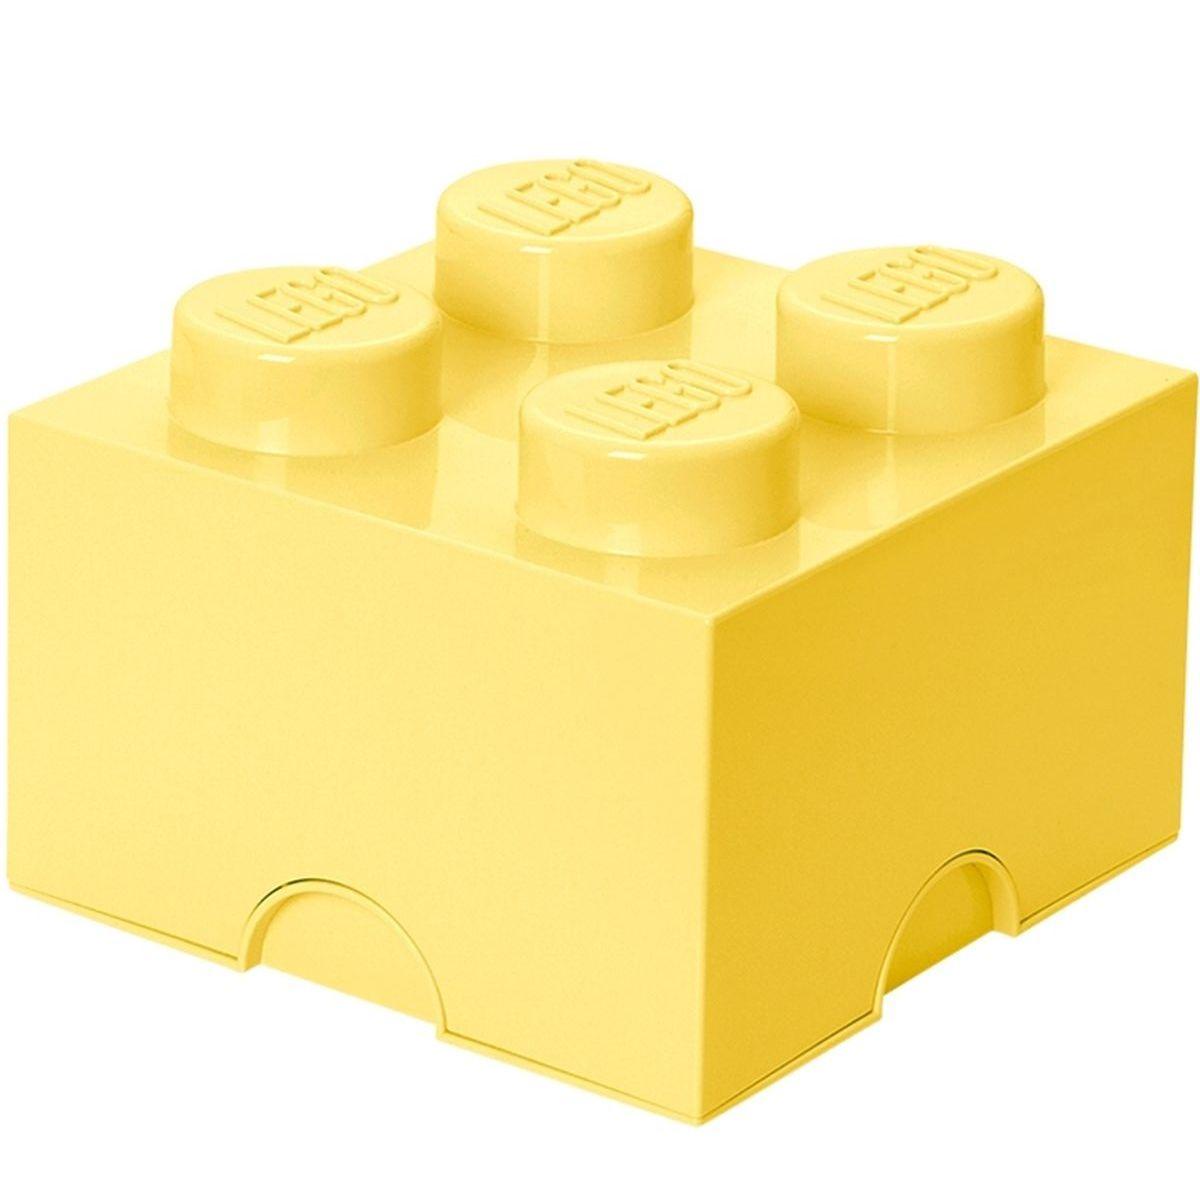 LEGO Úložný box 25x25x18cm Světle žlutá